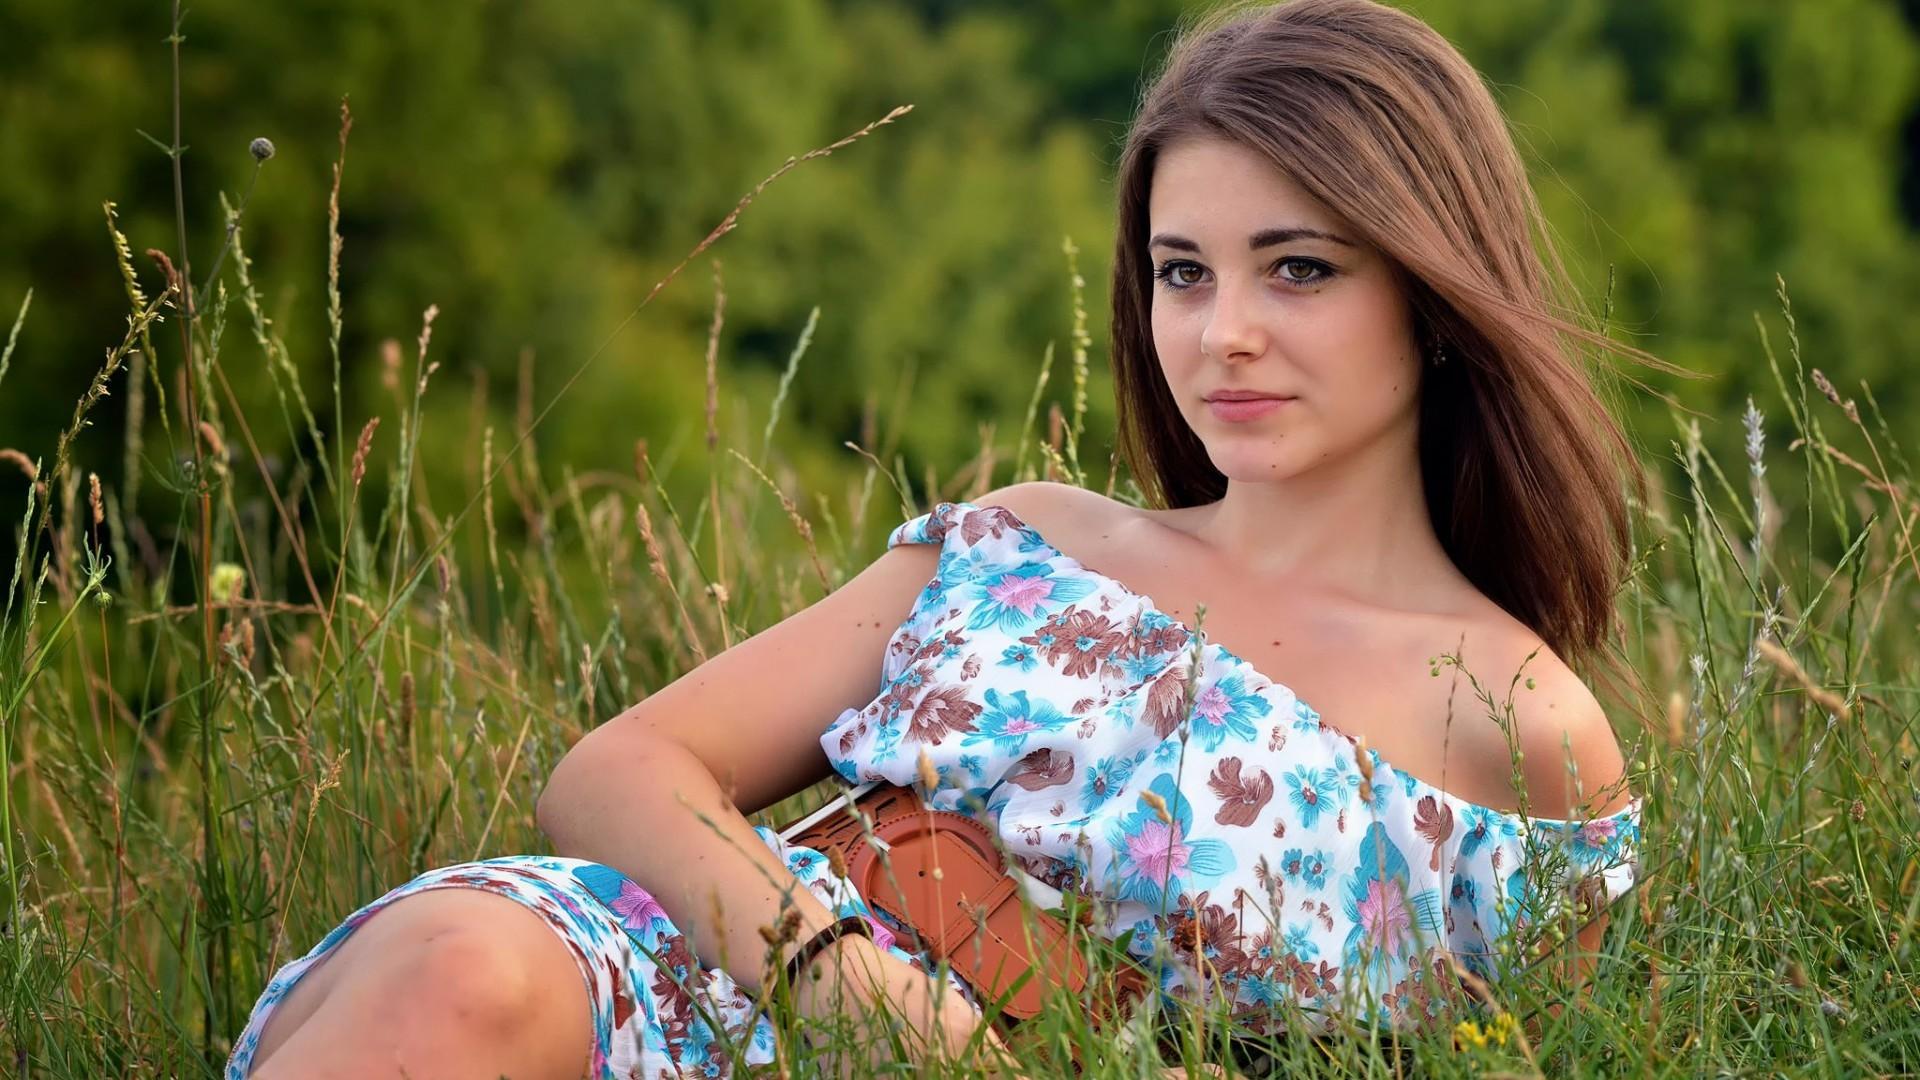 Wallpaper  Women Outdoors, Long Hair, Nature, Bare Shoulders, Grass, Dress, Smiling -7564